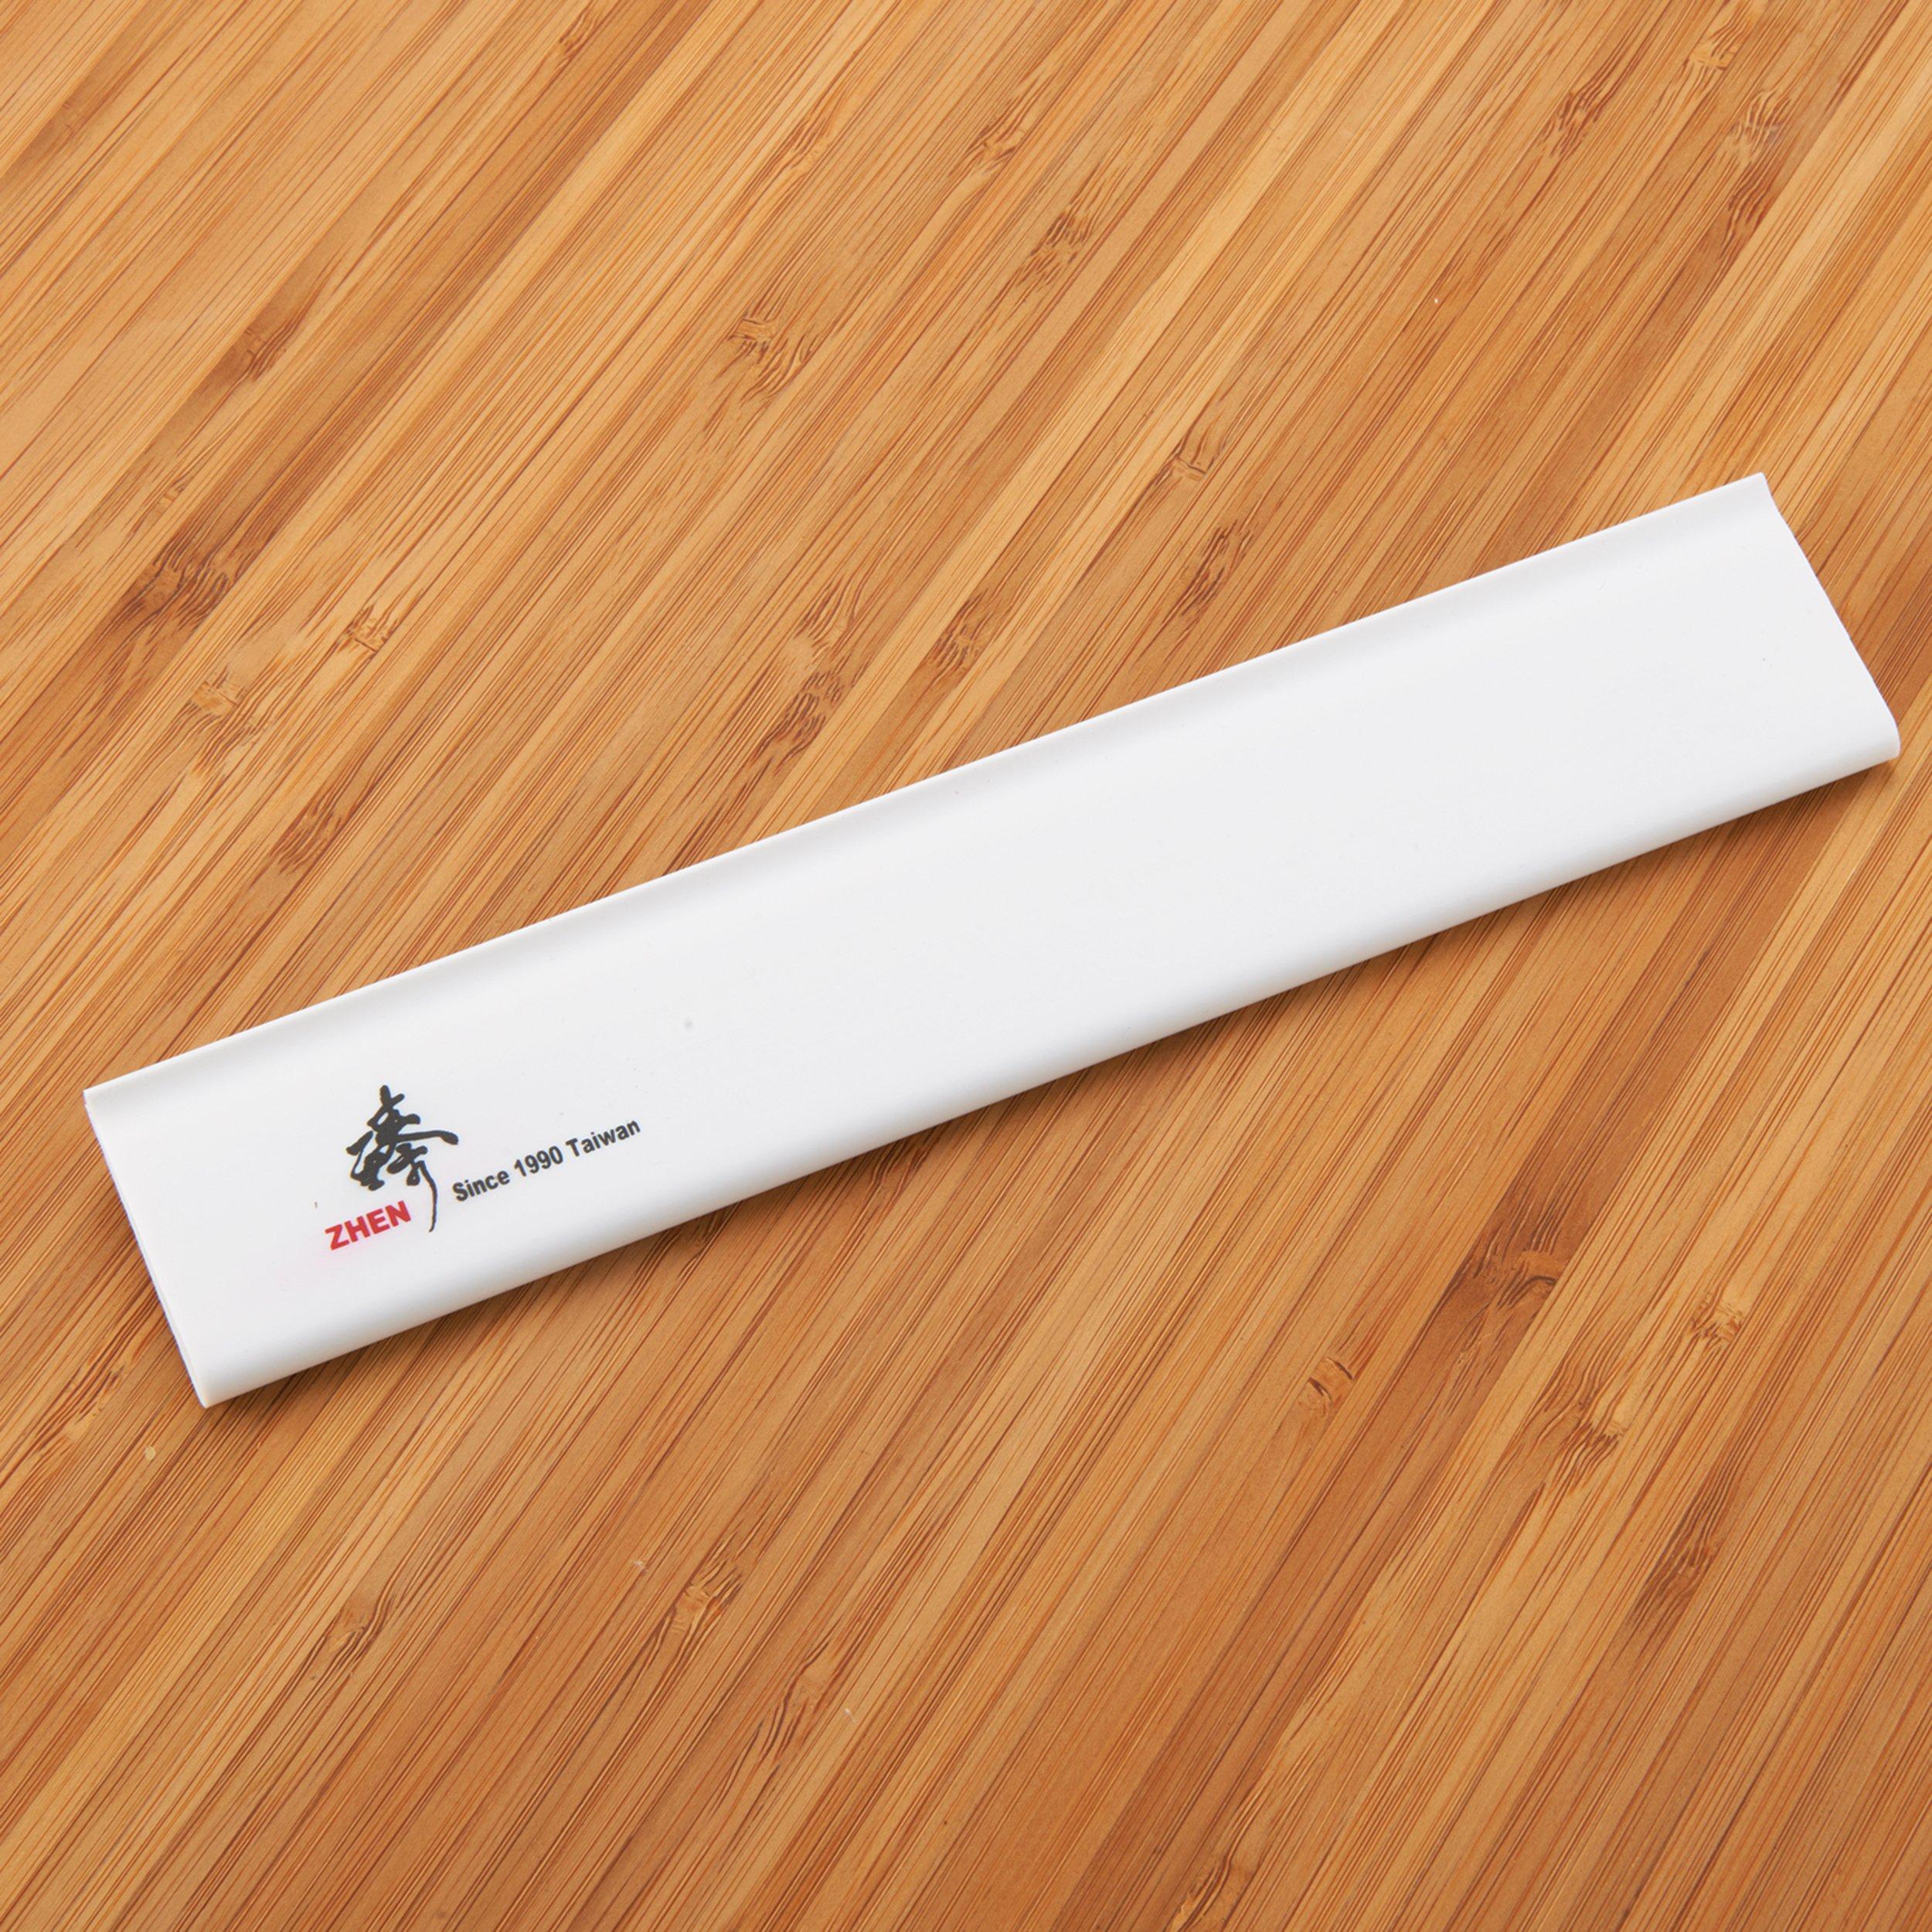 Zhen Kitchen Knife Cover, 2.6 cm x 13.5 cm (1'' x 5-5/16'')